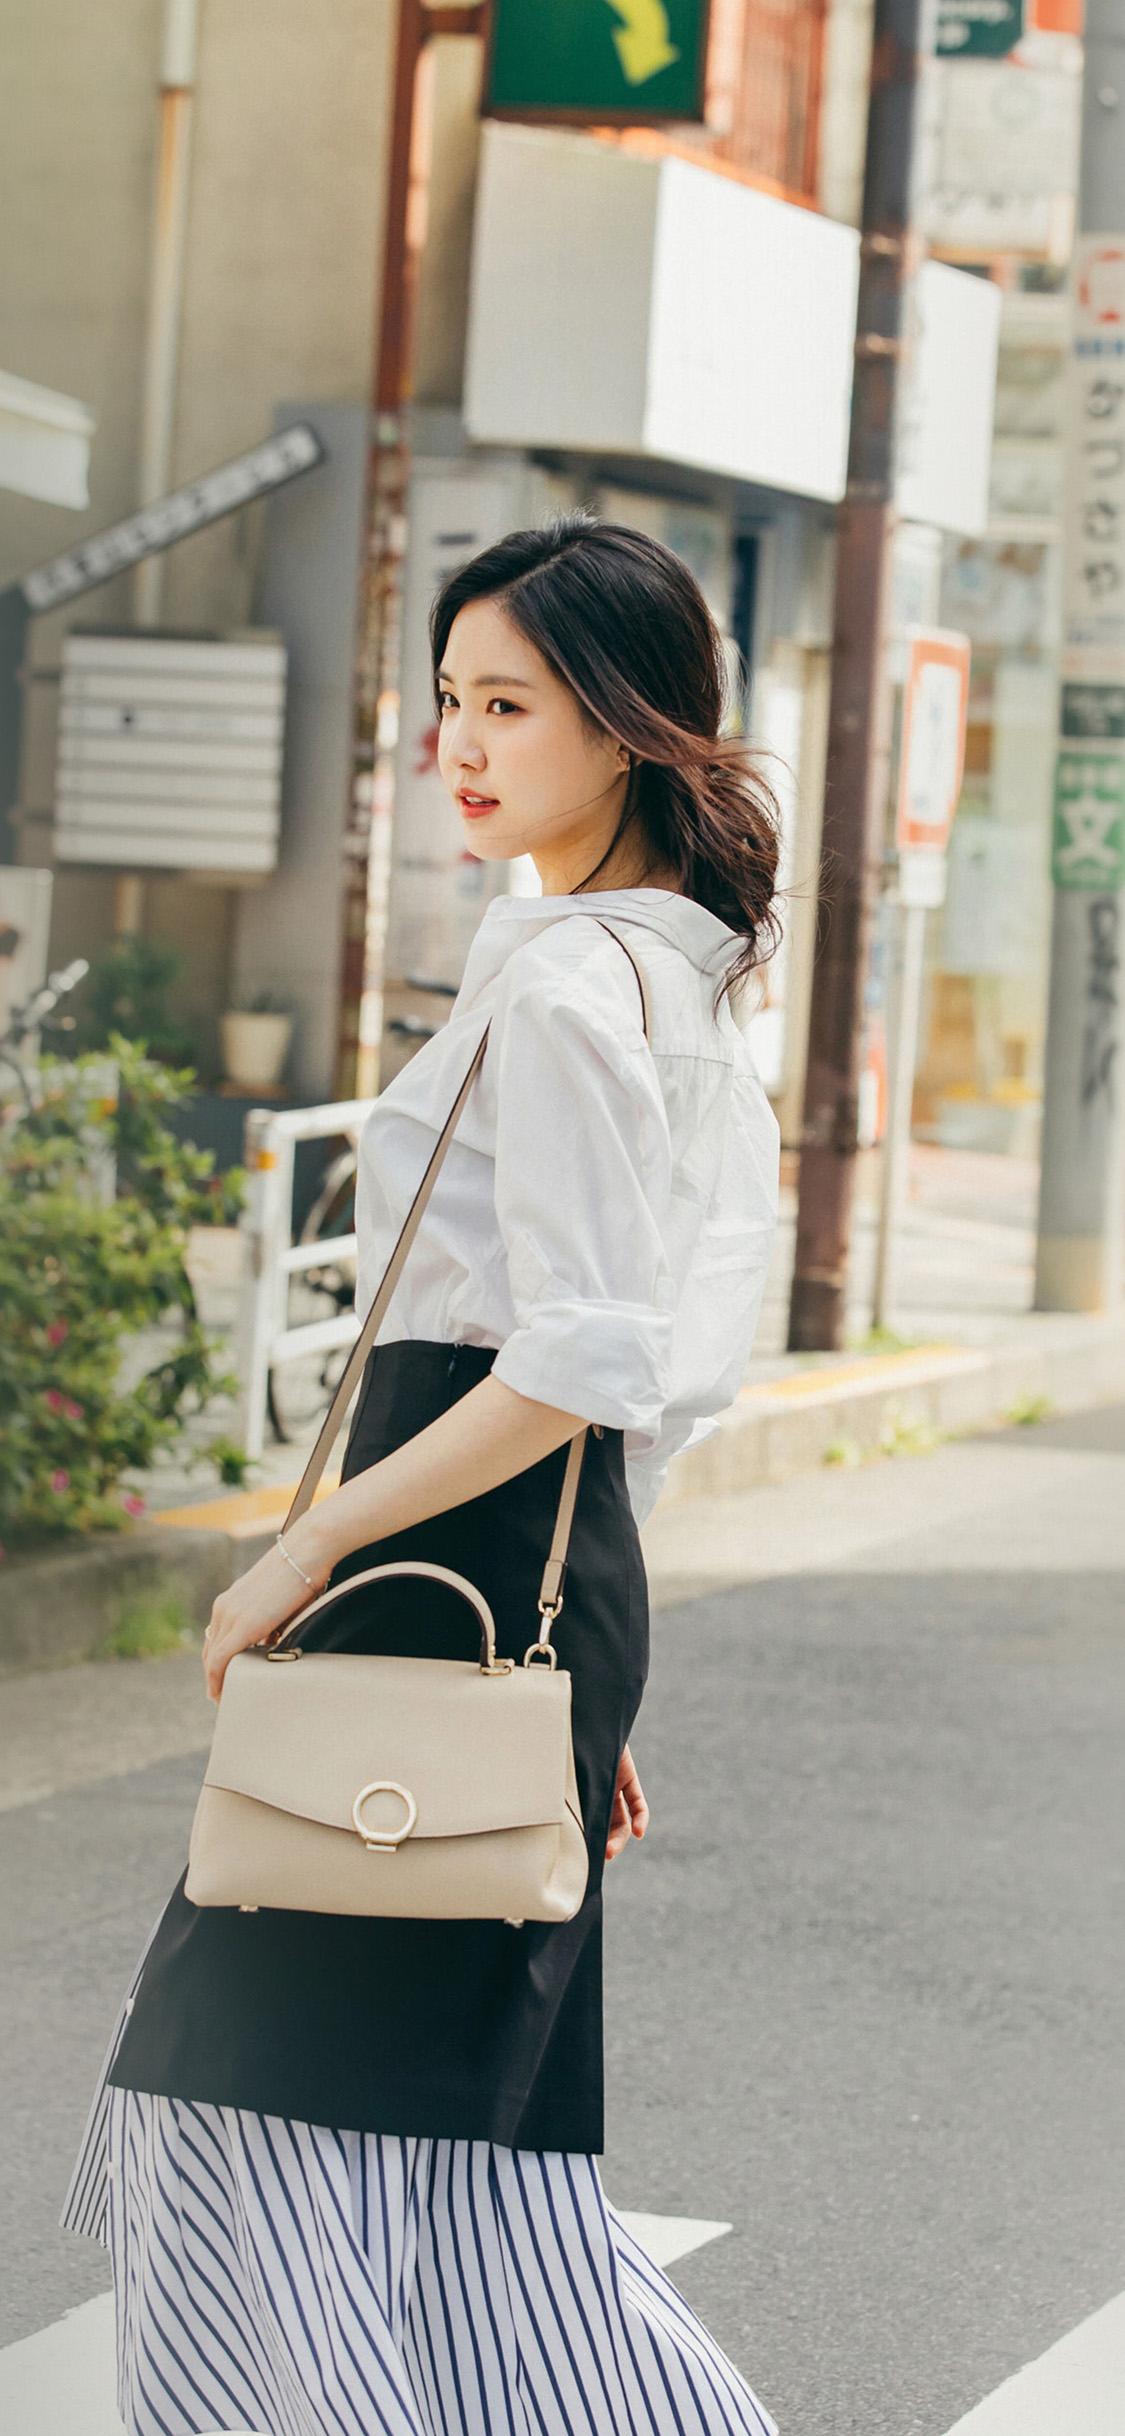 iPhonexpapers.com-Apple-iPhone-wallpaper-hq35-girl-spring-cute-asian-kpop